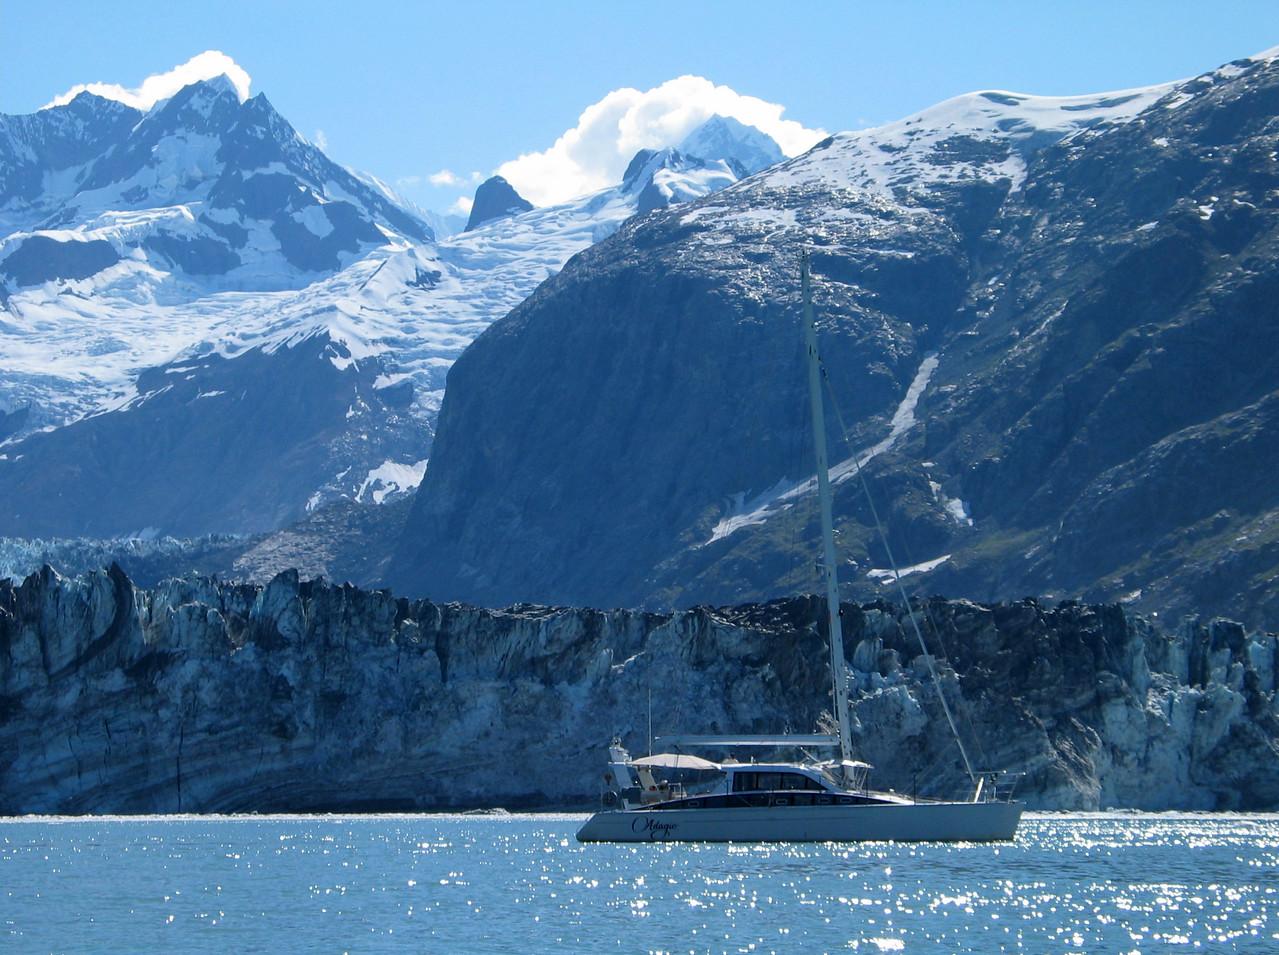 ADAGIO at Johns Hopkins Glacier